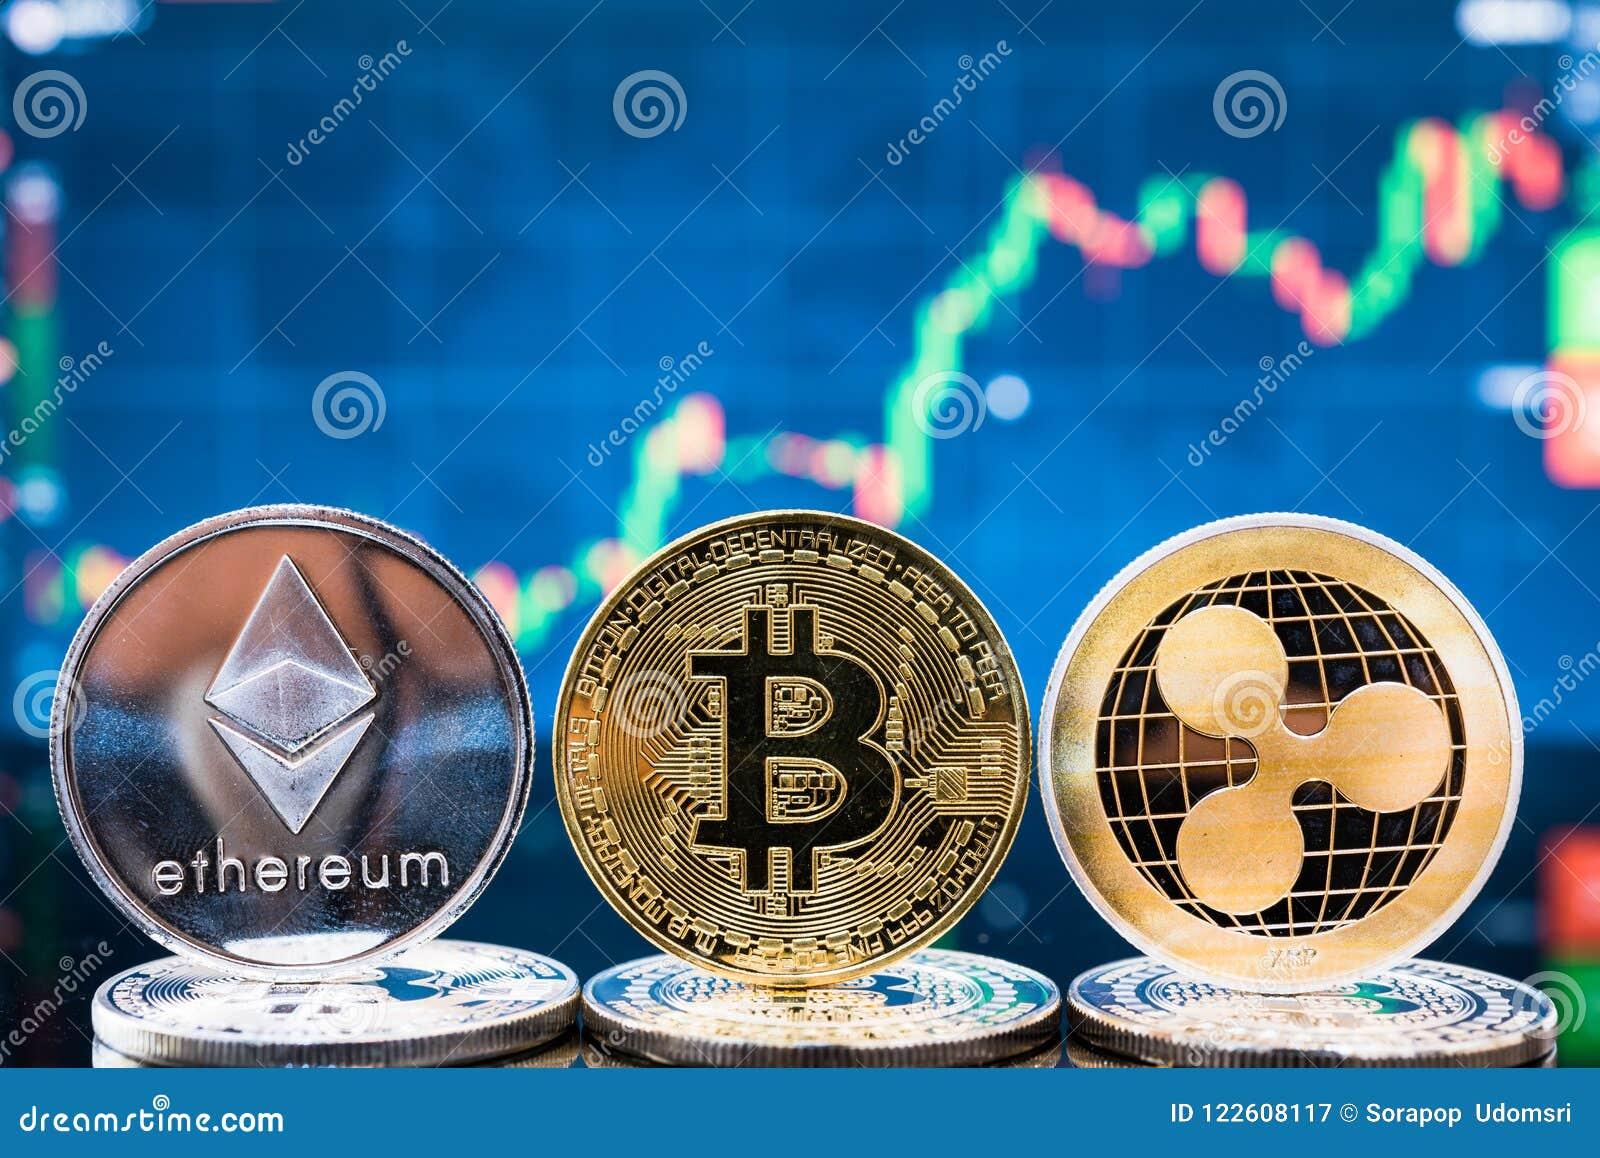 crypto coin ethereum